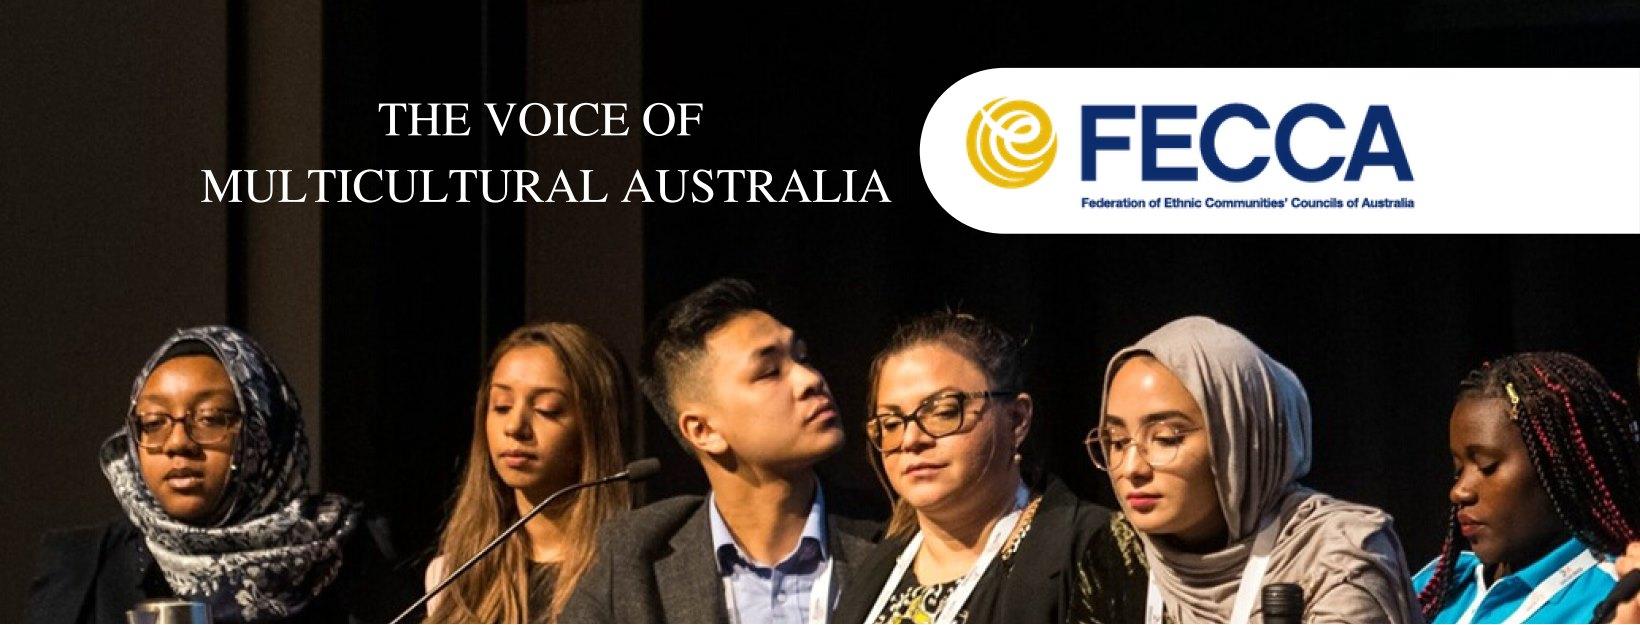 The Federation of Ethnic Communities' Councils of Australia (FECCA)